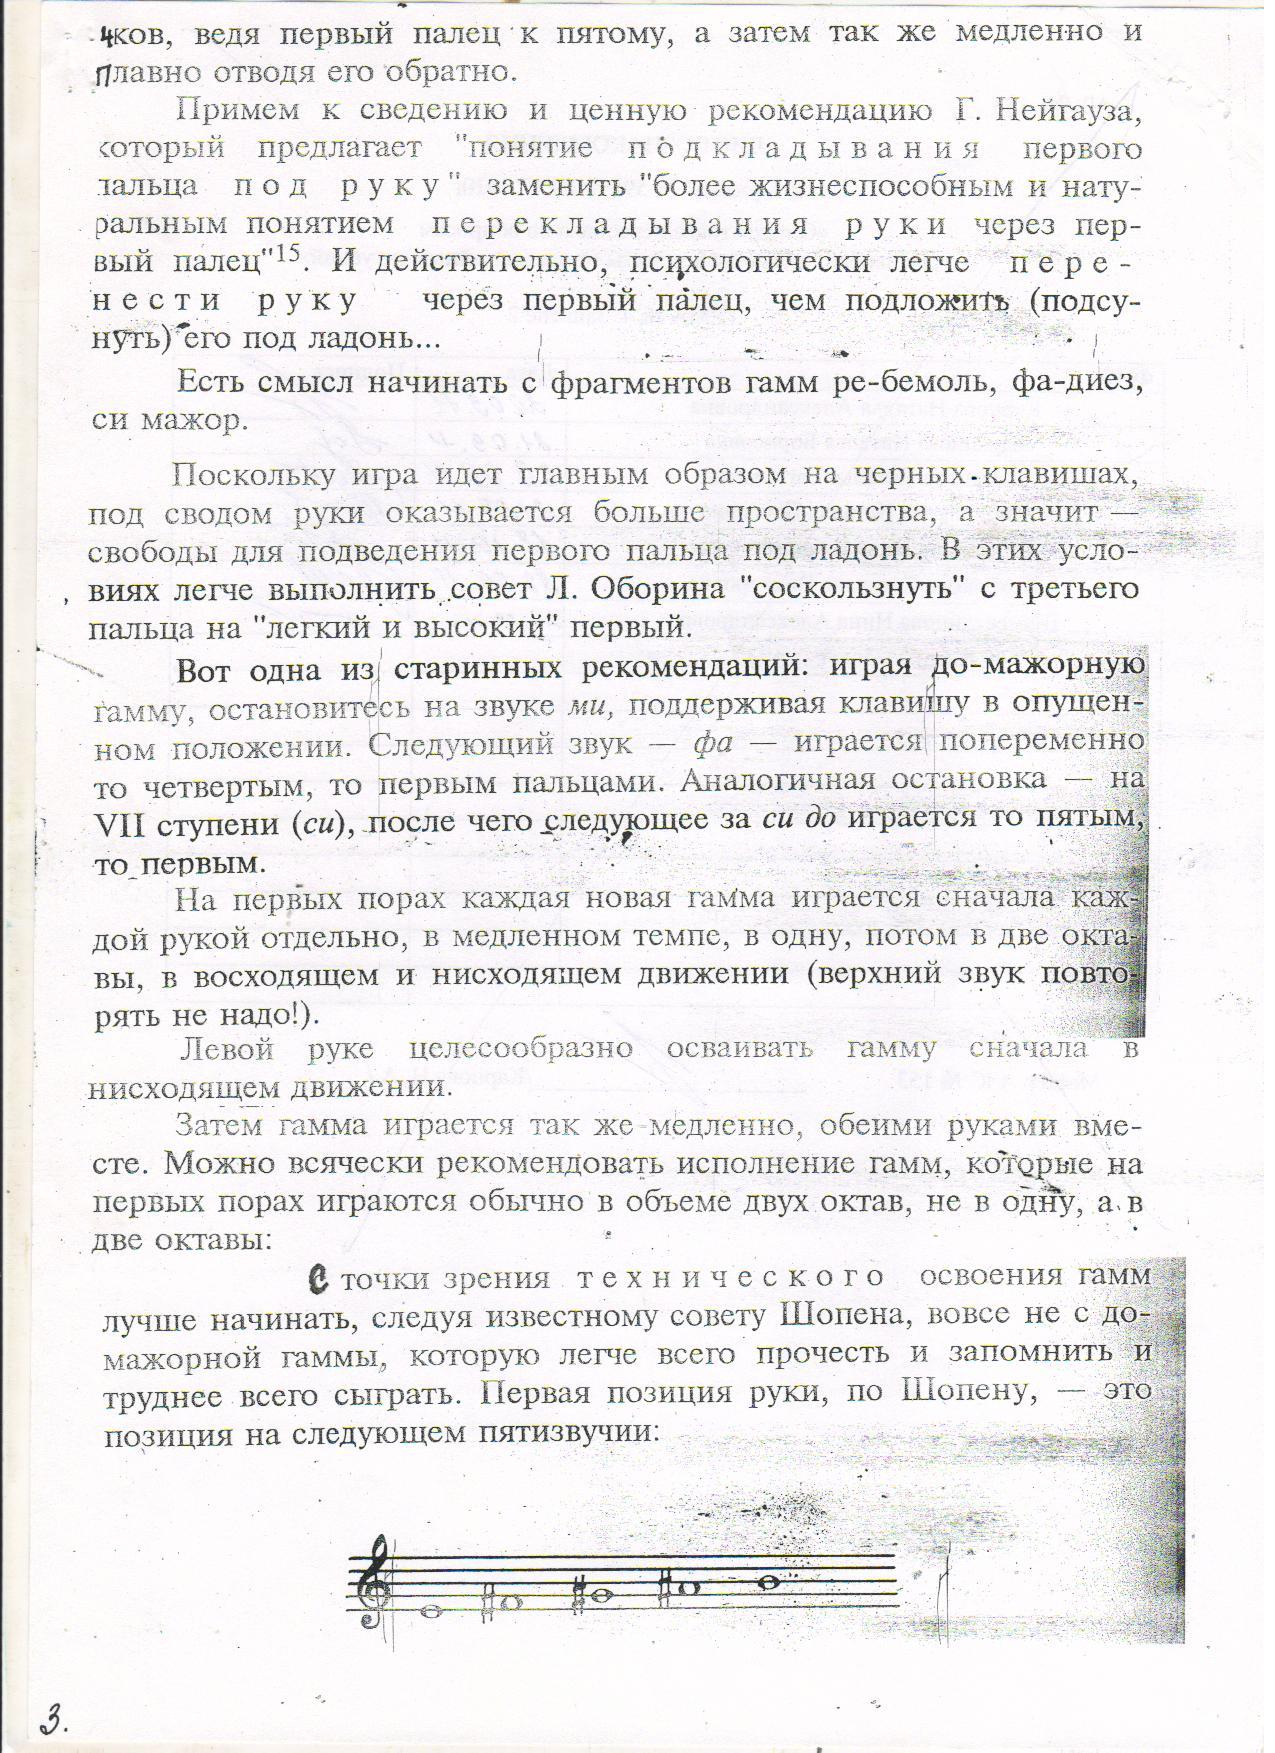 C:\Documents and Settings\Учитель\Рабочий стол\гаммы 4.jpg